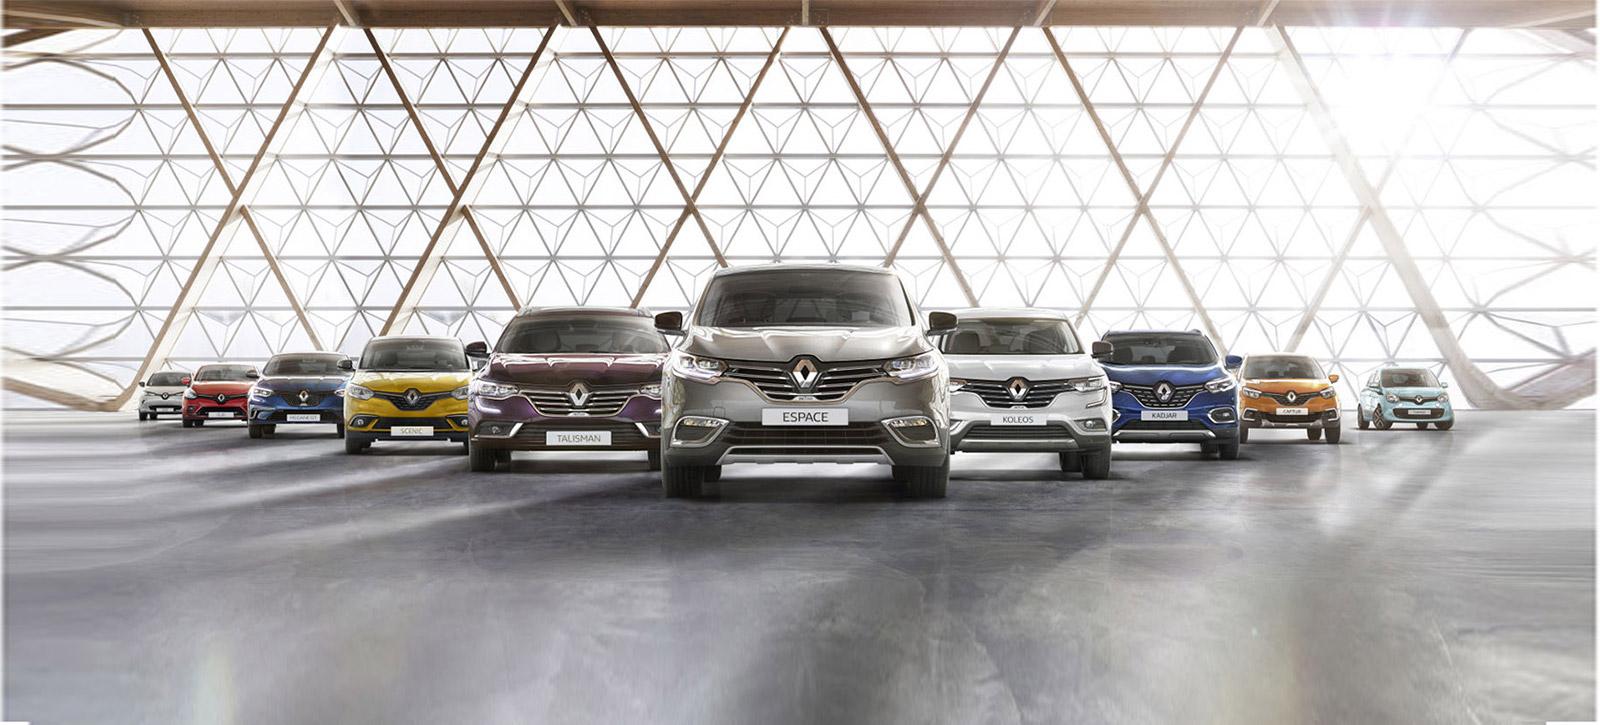 In Studio - Renault ZOE, Clio, Mégane GT, Scenic, Talisman, Espace, Koleos, Kadjar, Captur, Twingo